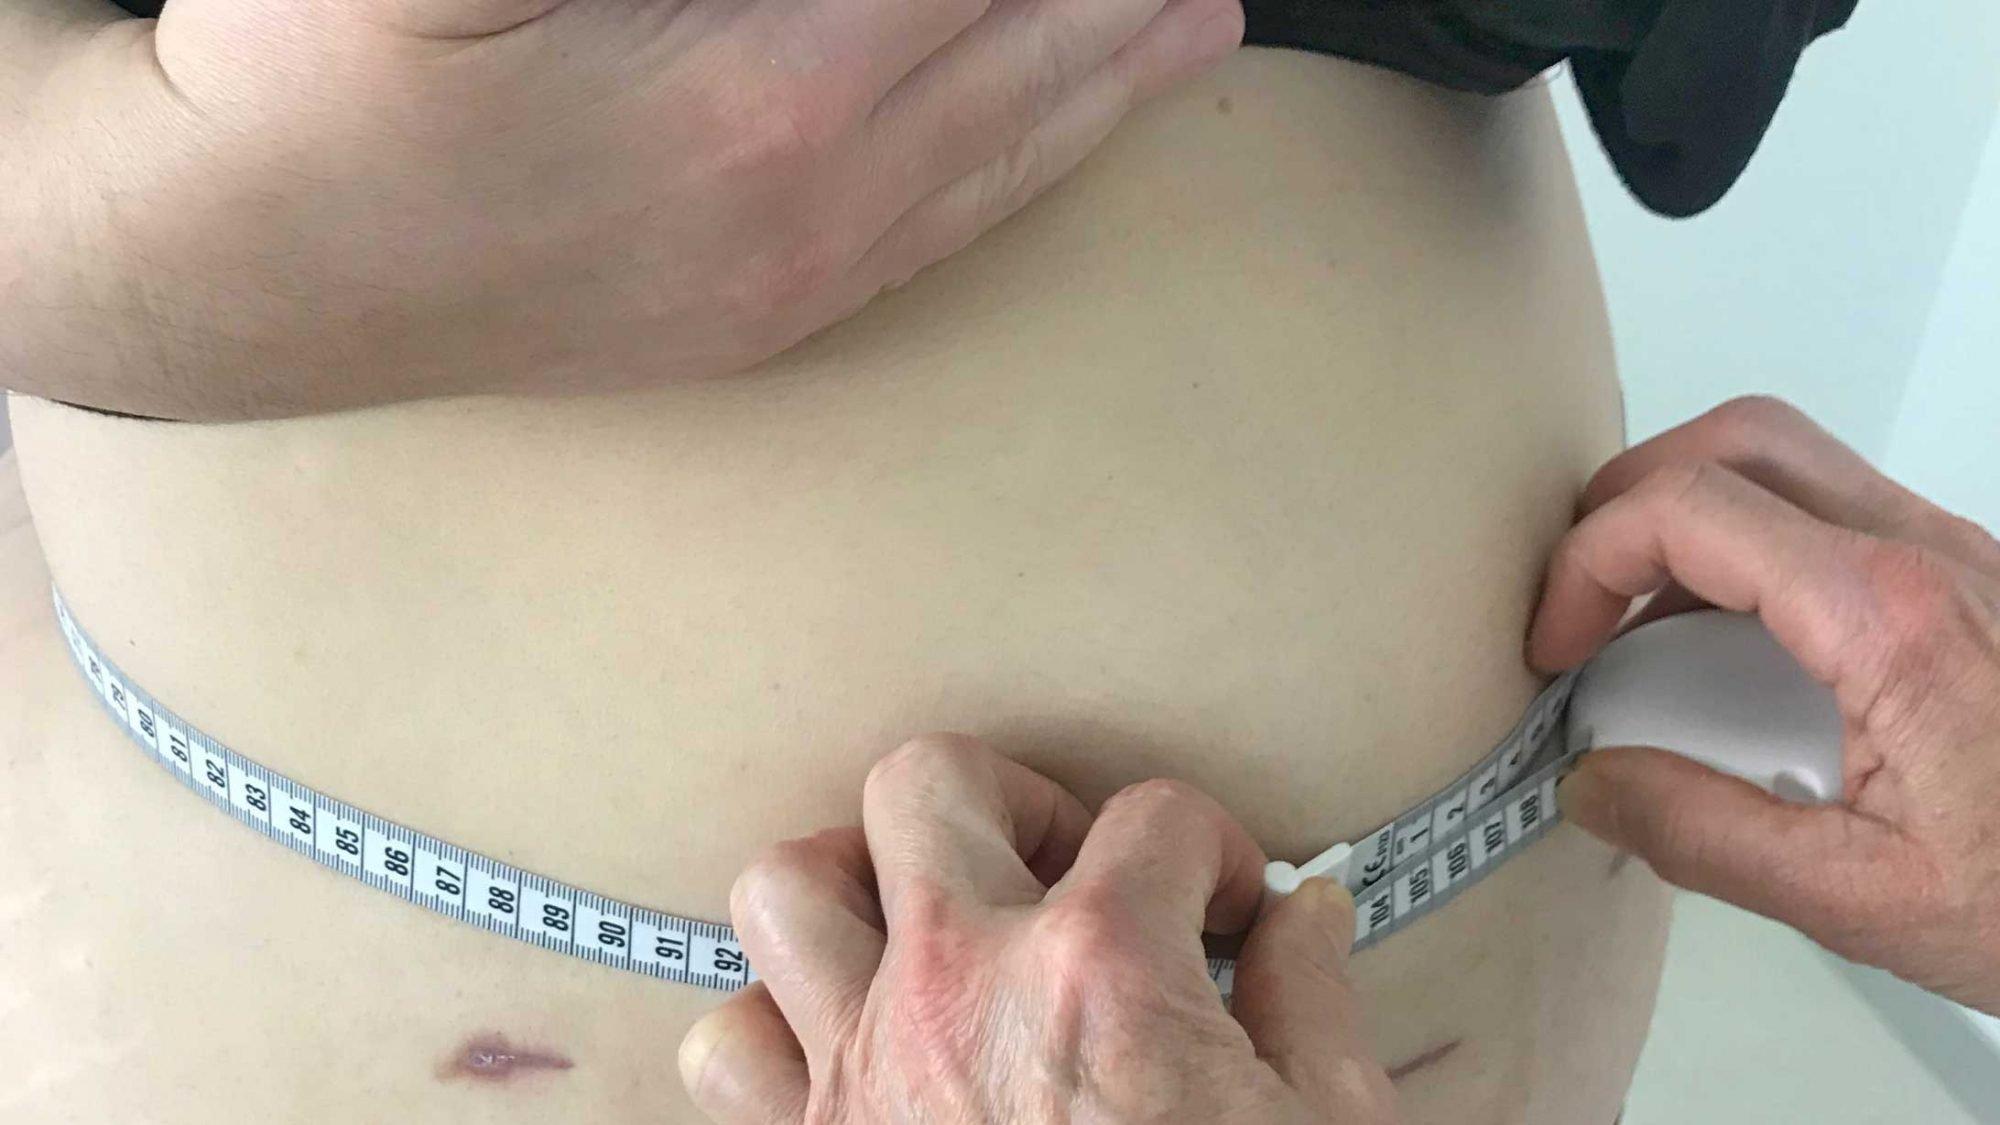 Fabian Deichsel misst den Bauchumfang der Patientin.